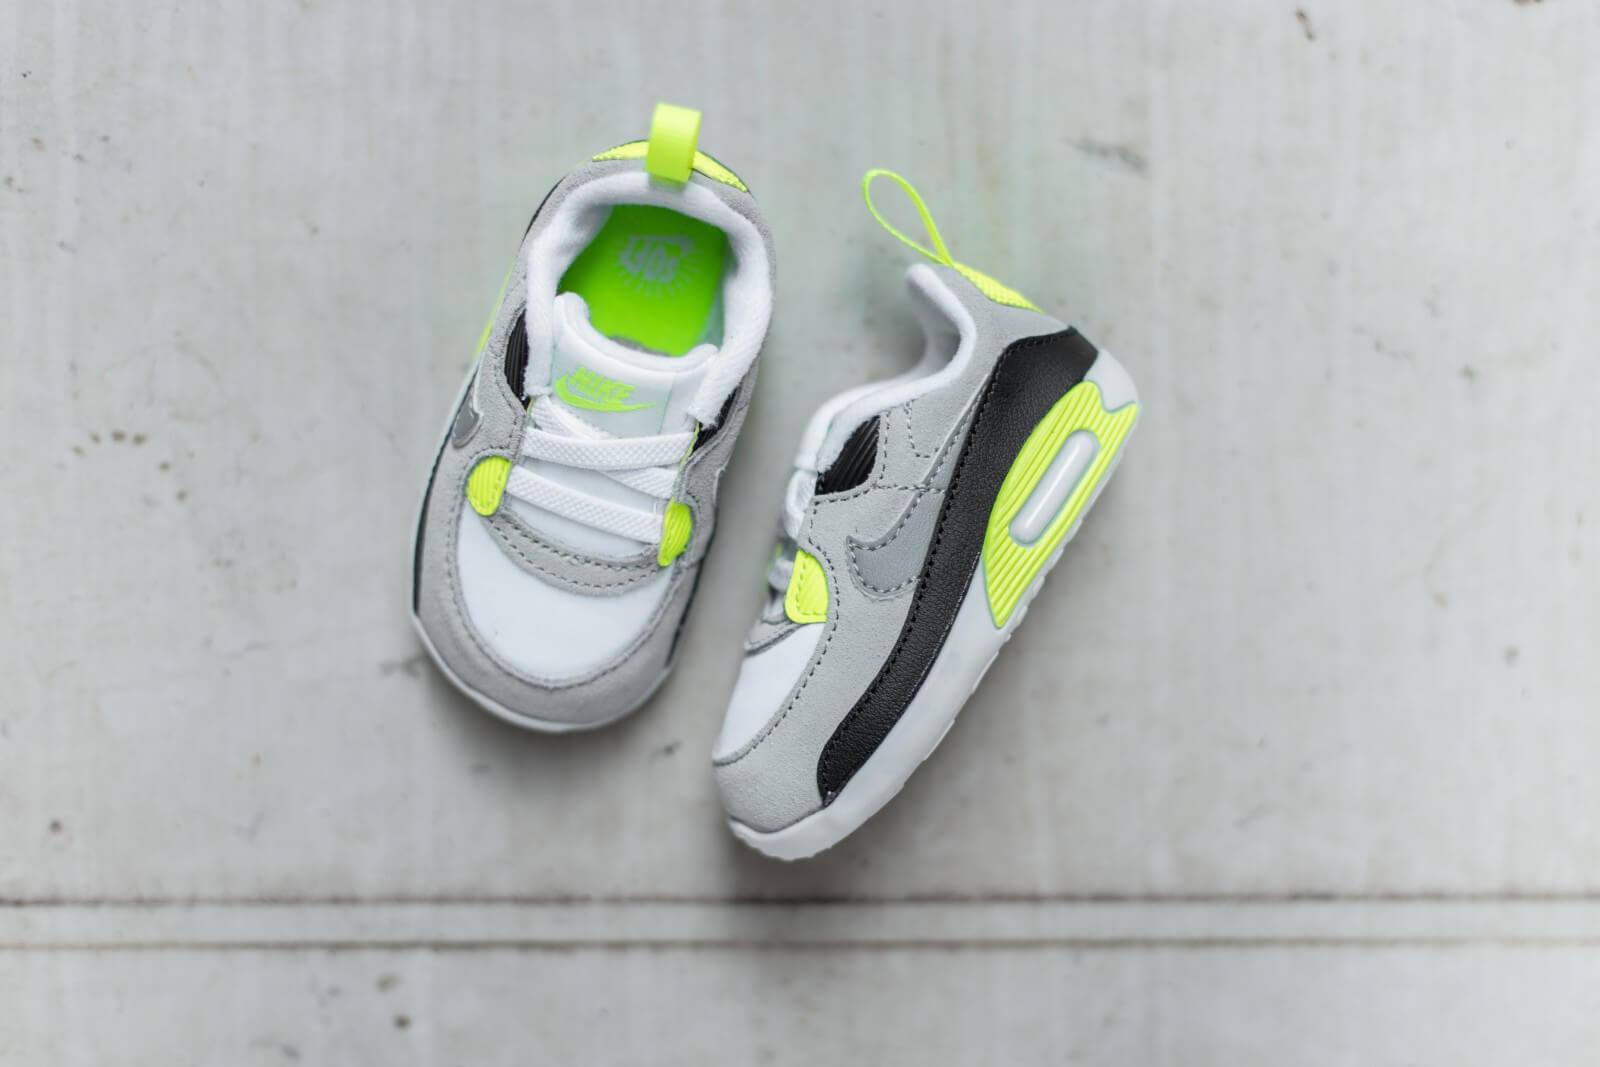 Nike Air Max 90 Ultra Moire Hologram izabo.co.uk